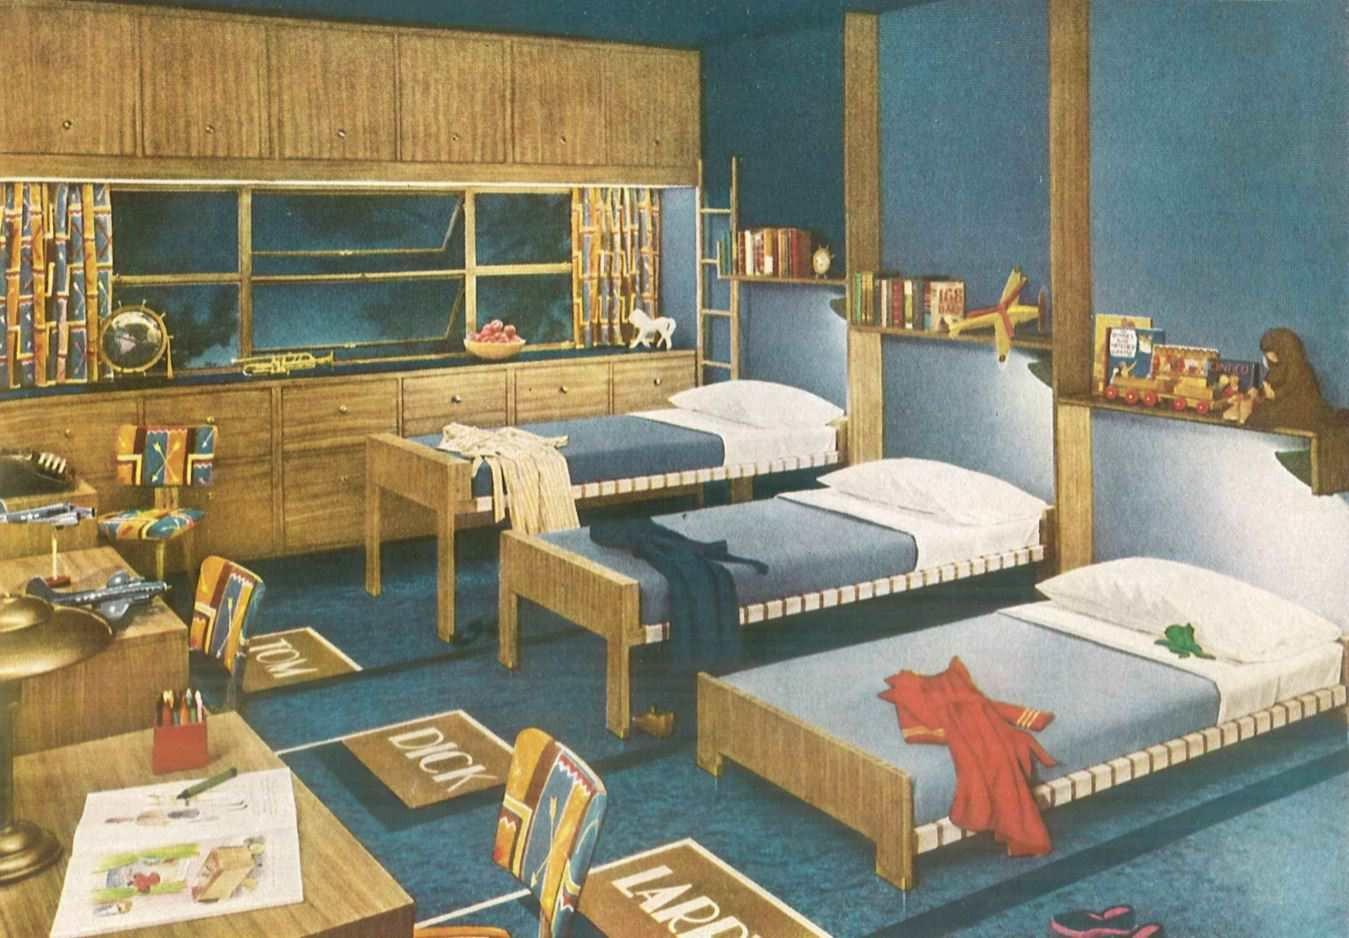 1940s Bedroom Furniture Styles Luxury 1940s Interior Home Design